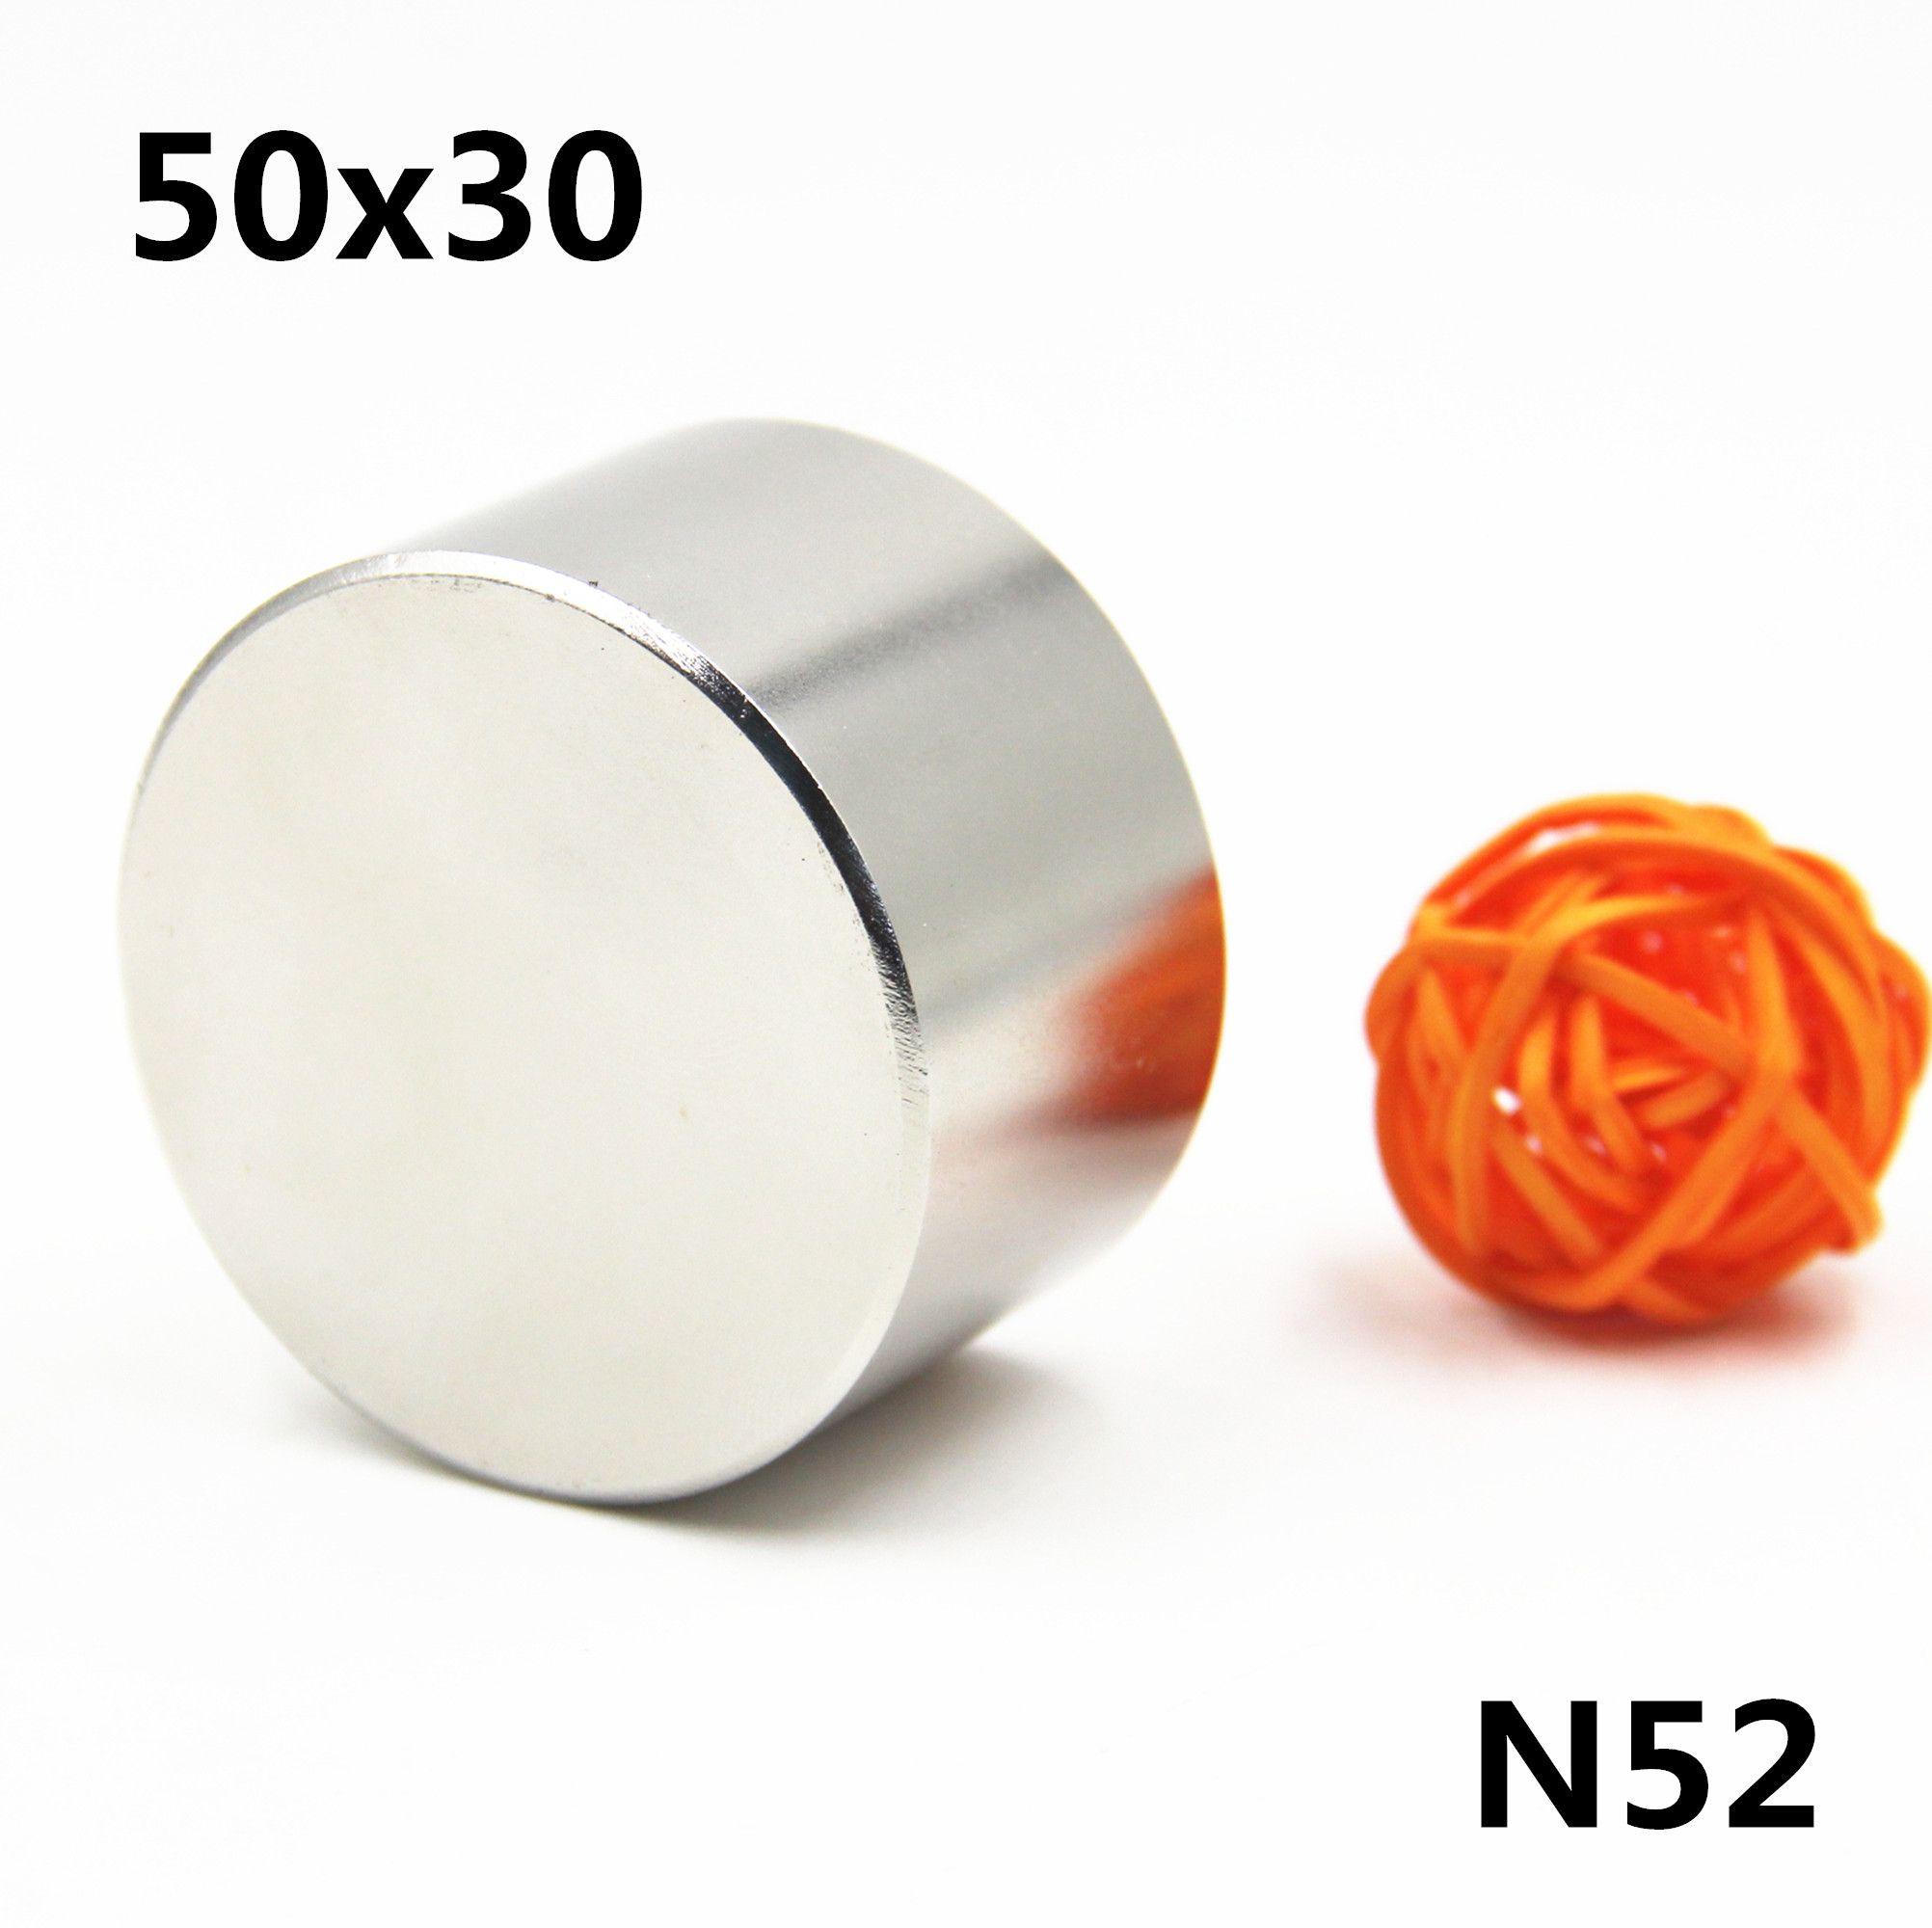 1 pcs/lot N52 Dia 50x30mm aimant rond chaud aimants forts aimant néodyme terre Rare 50x30mm en gros 50*30mm